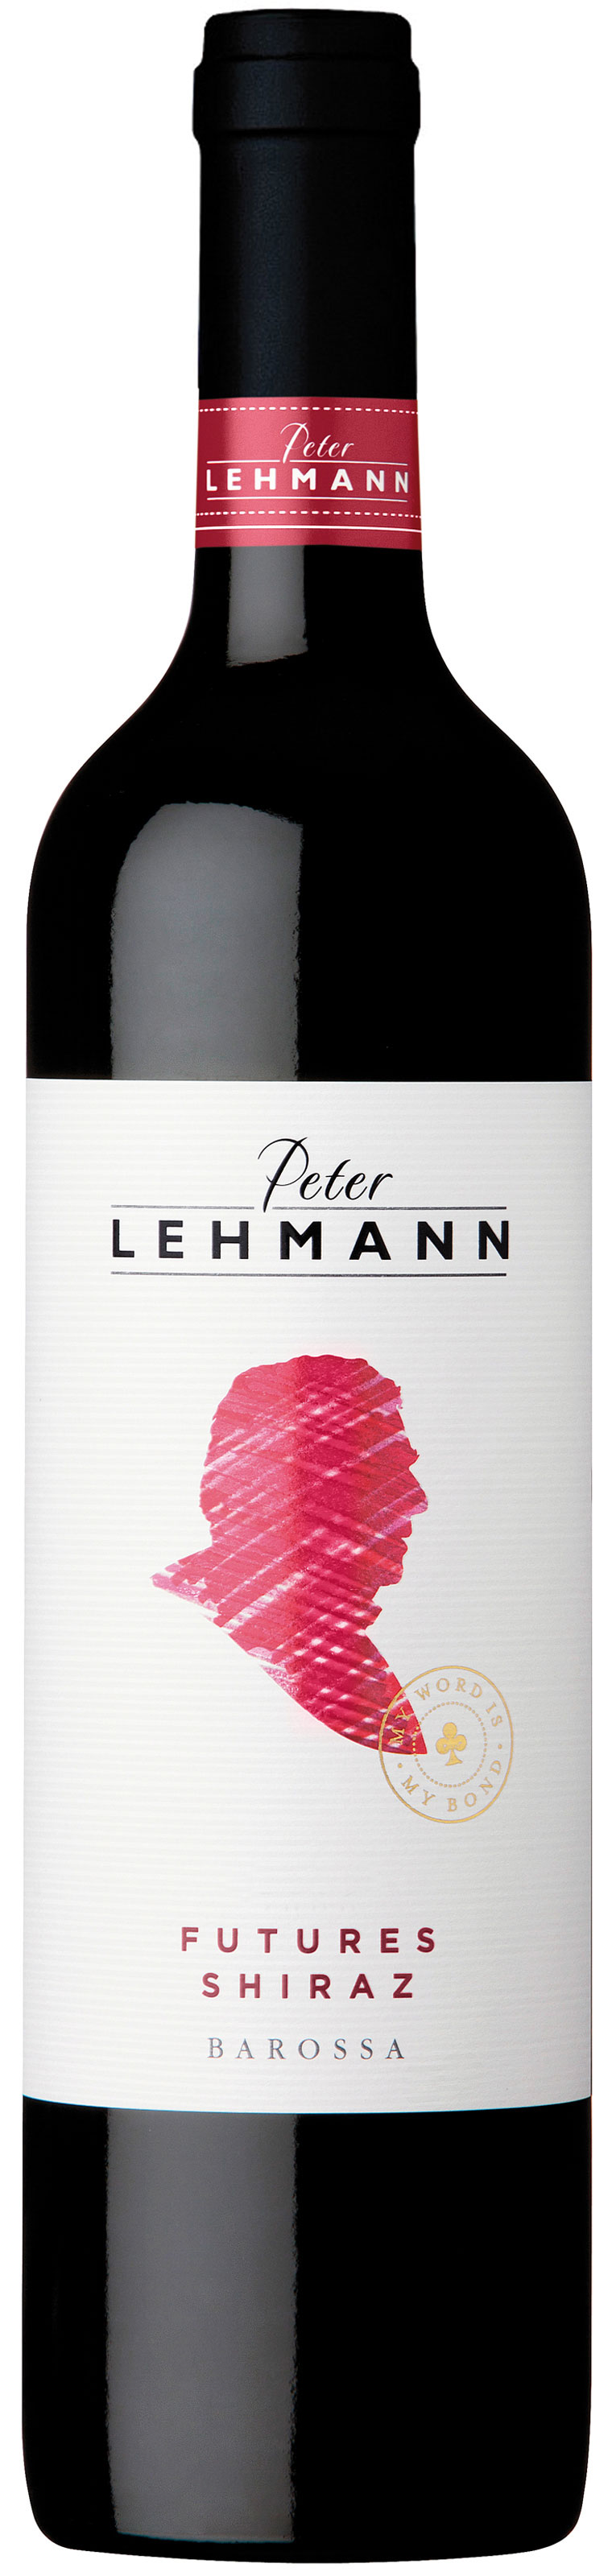 2013 The Futures Shiraz Peter Lehmann